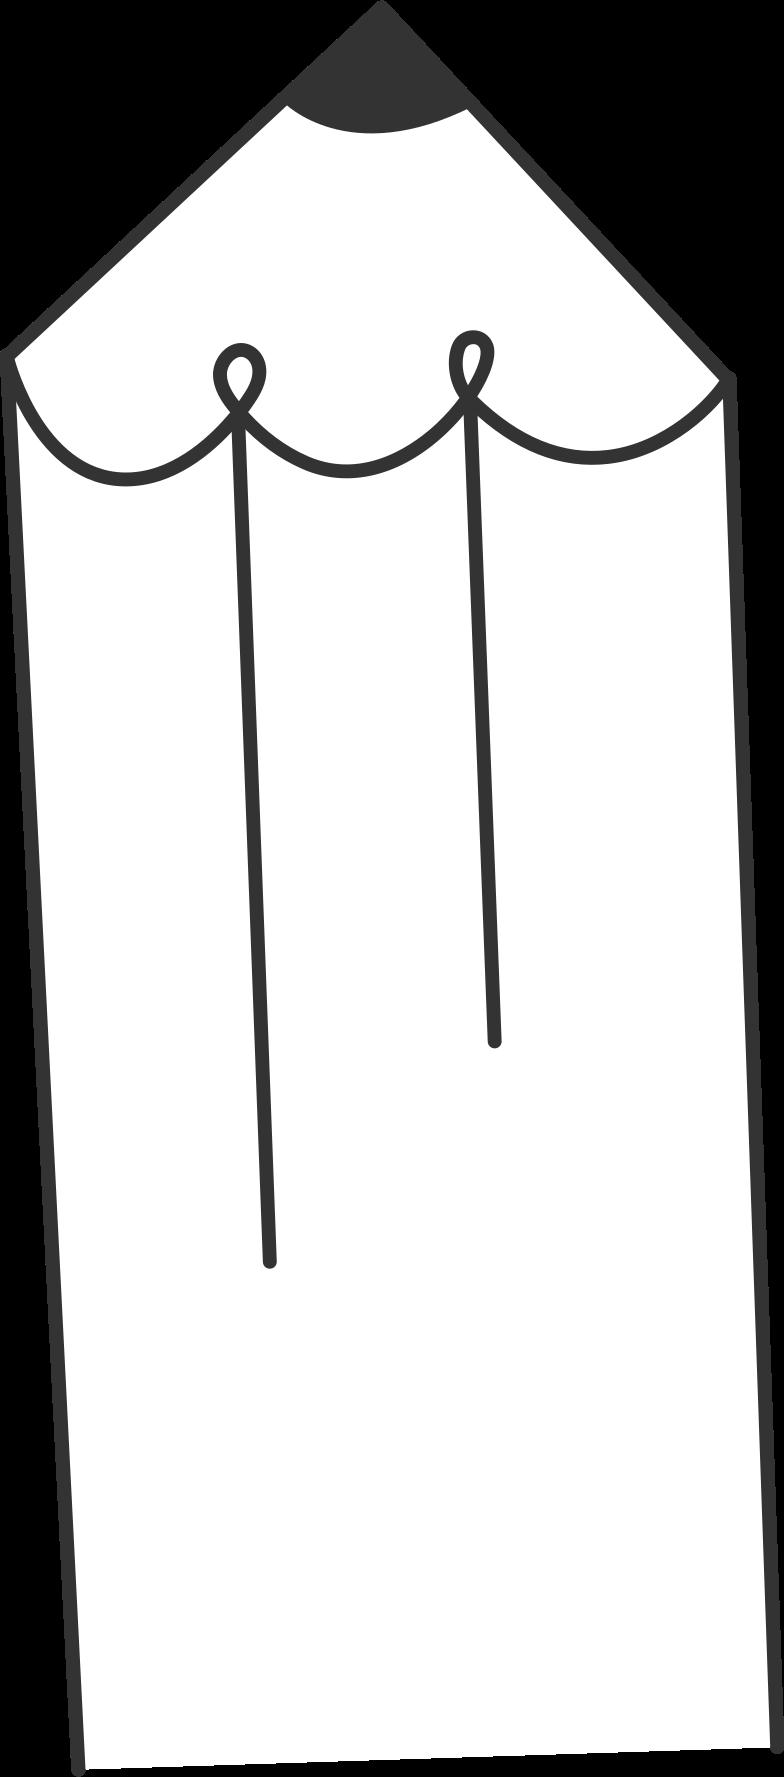 bad gateway  pencil Clipart illustration in PNG, SVG